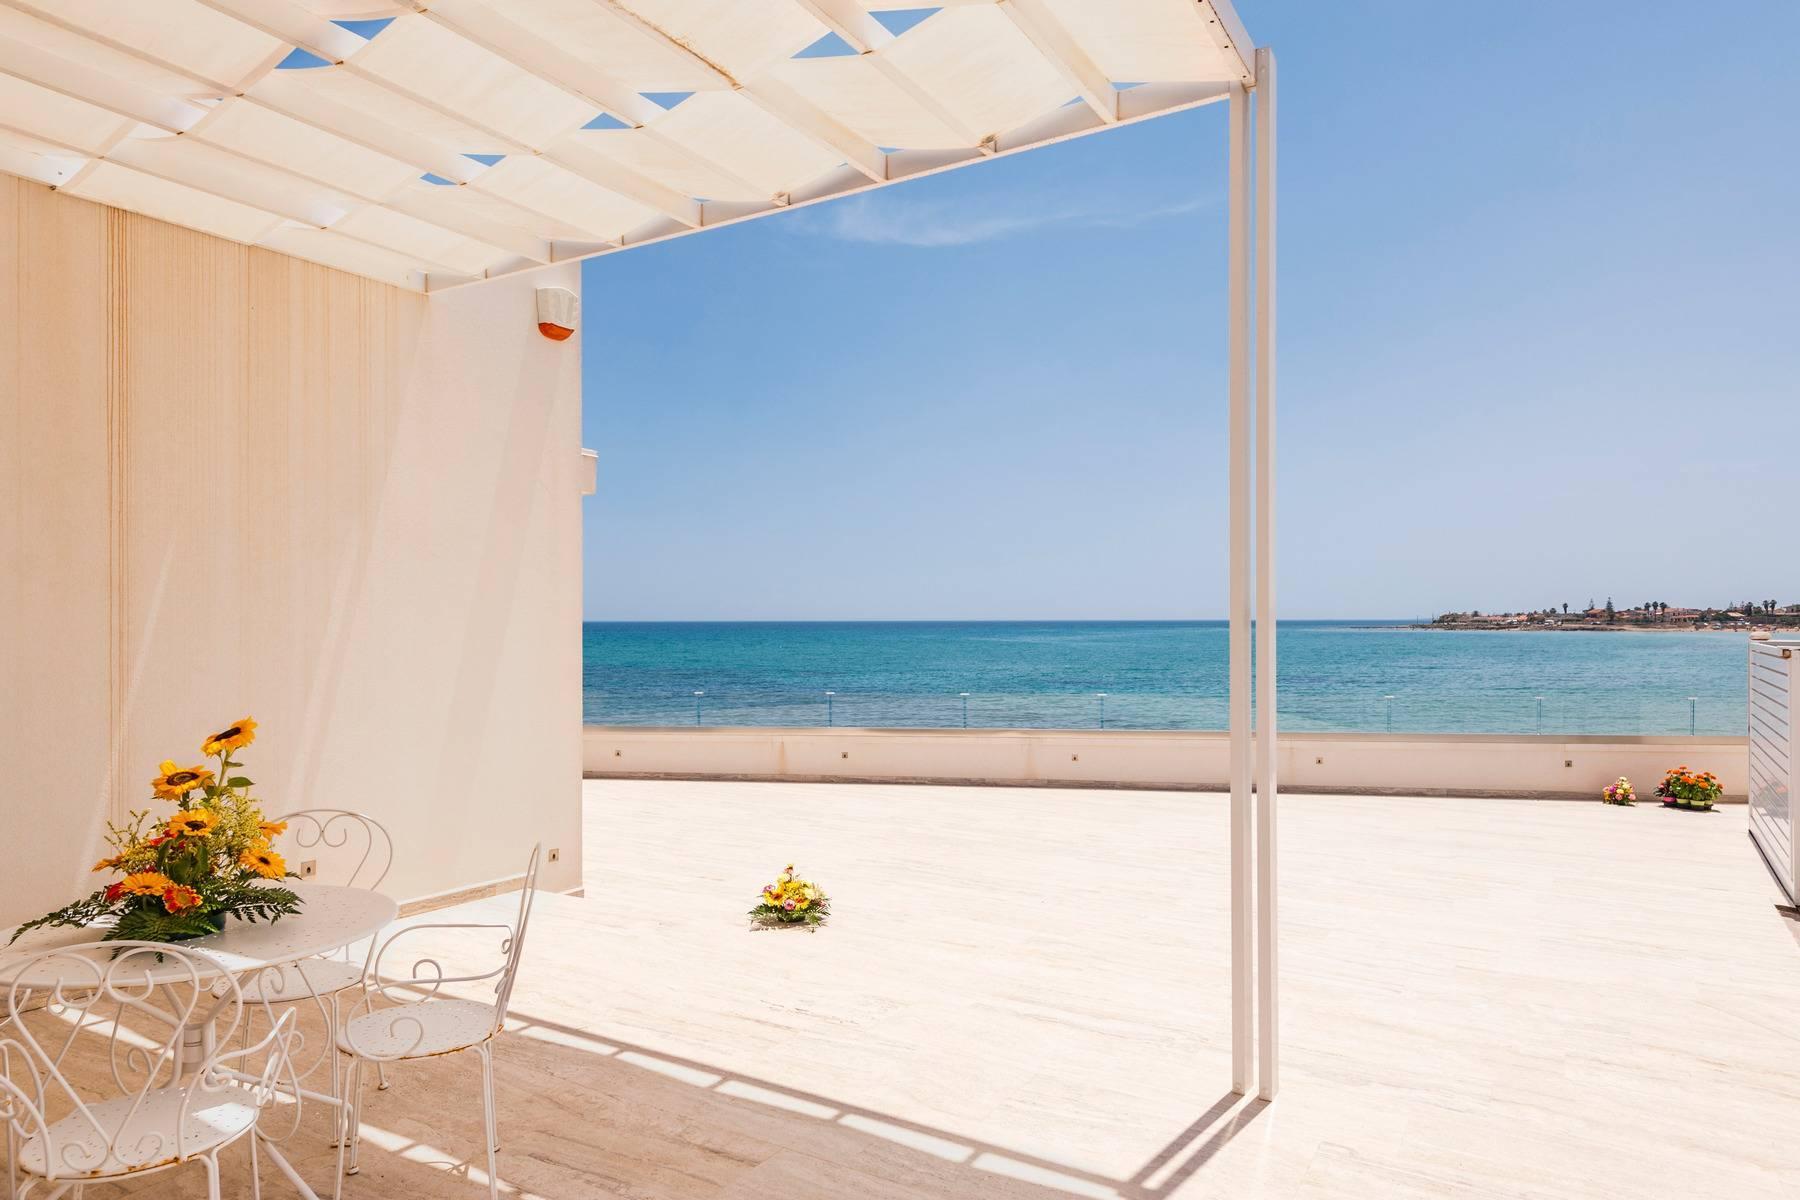 Exclusive villa with sea view in Avola - 2